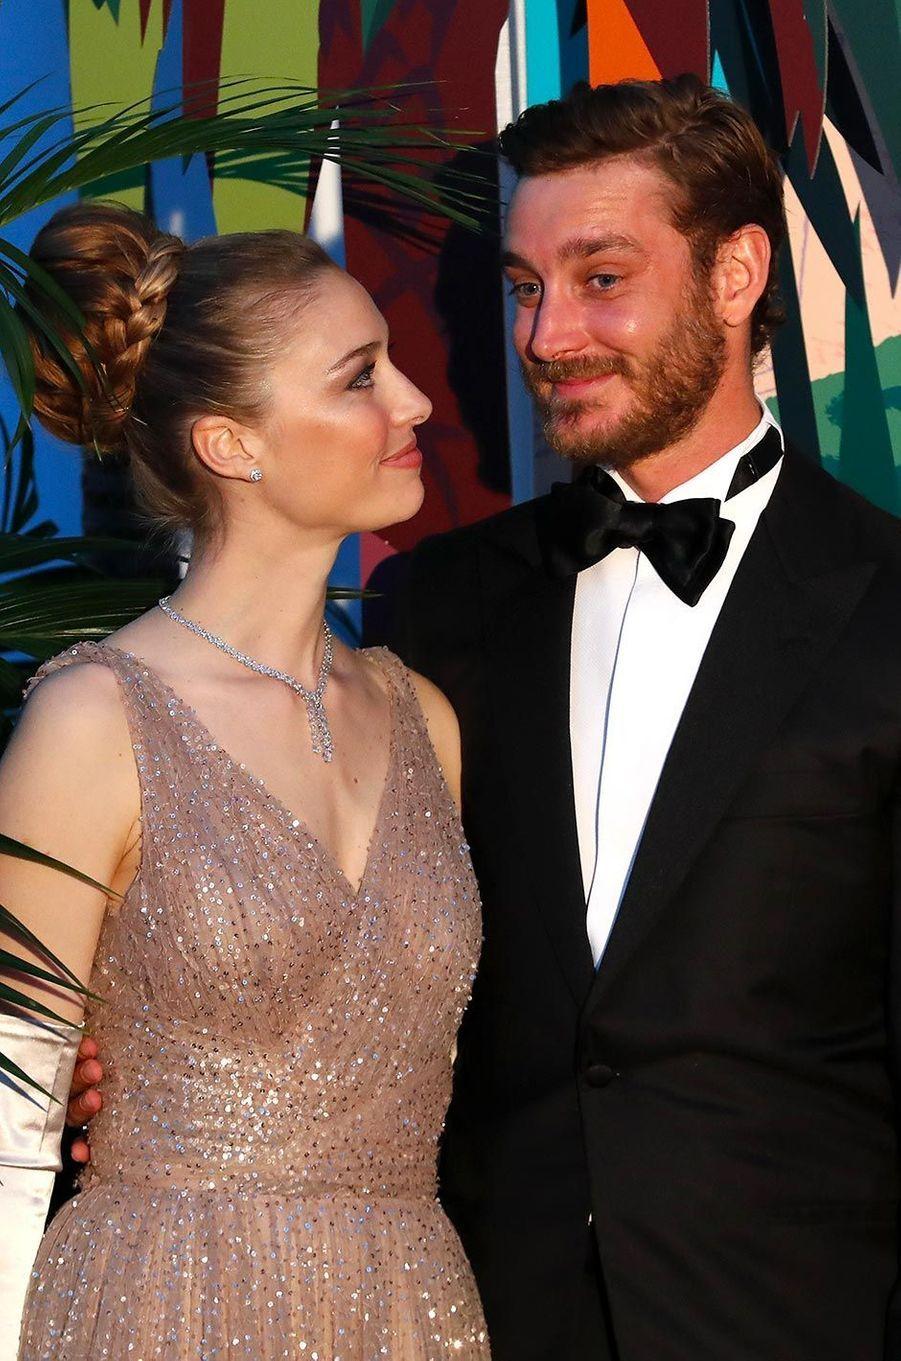 Beatrice Borromeo et Pierre Casiraghi au Bal de la Rose, au Sporting Monte-Carlo, le 30 mars 2019.